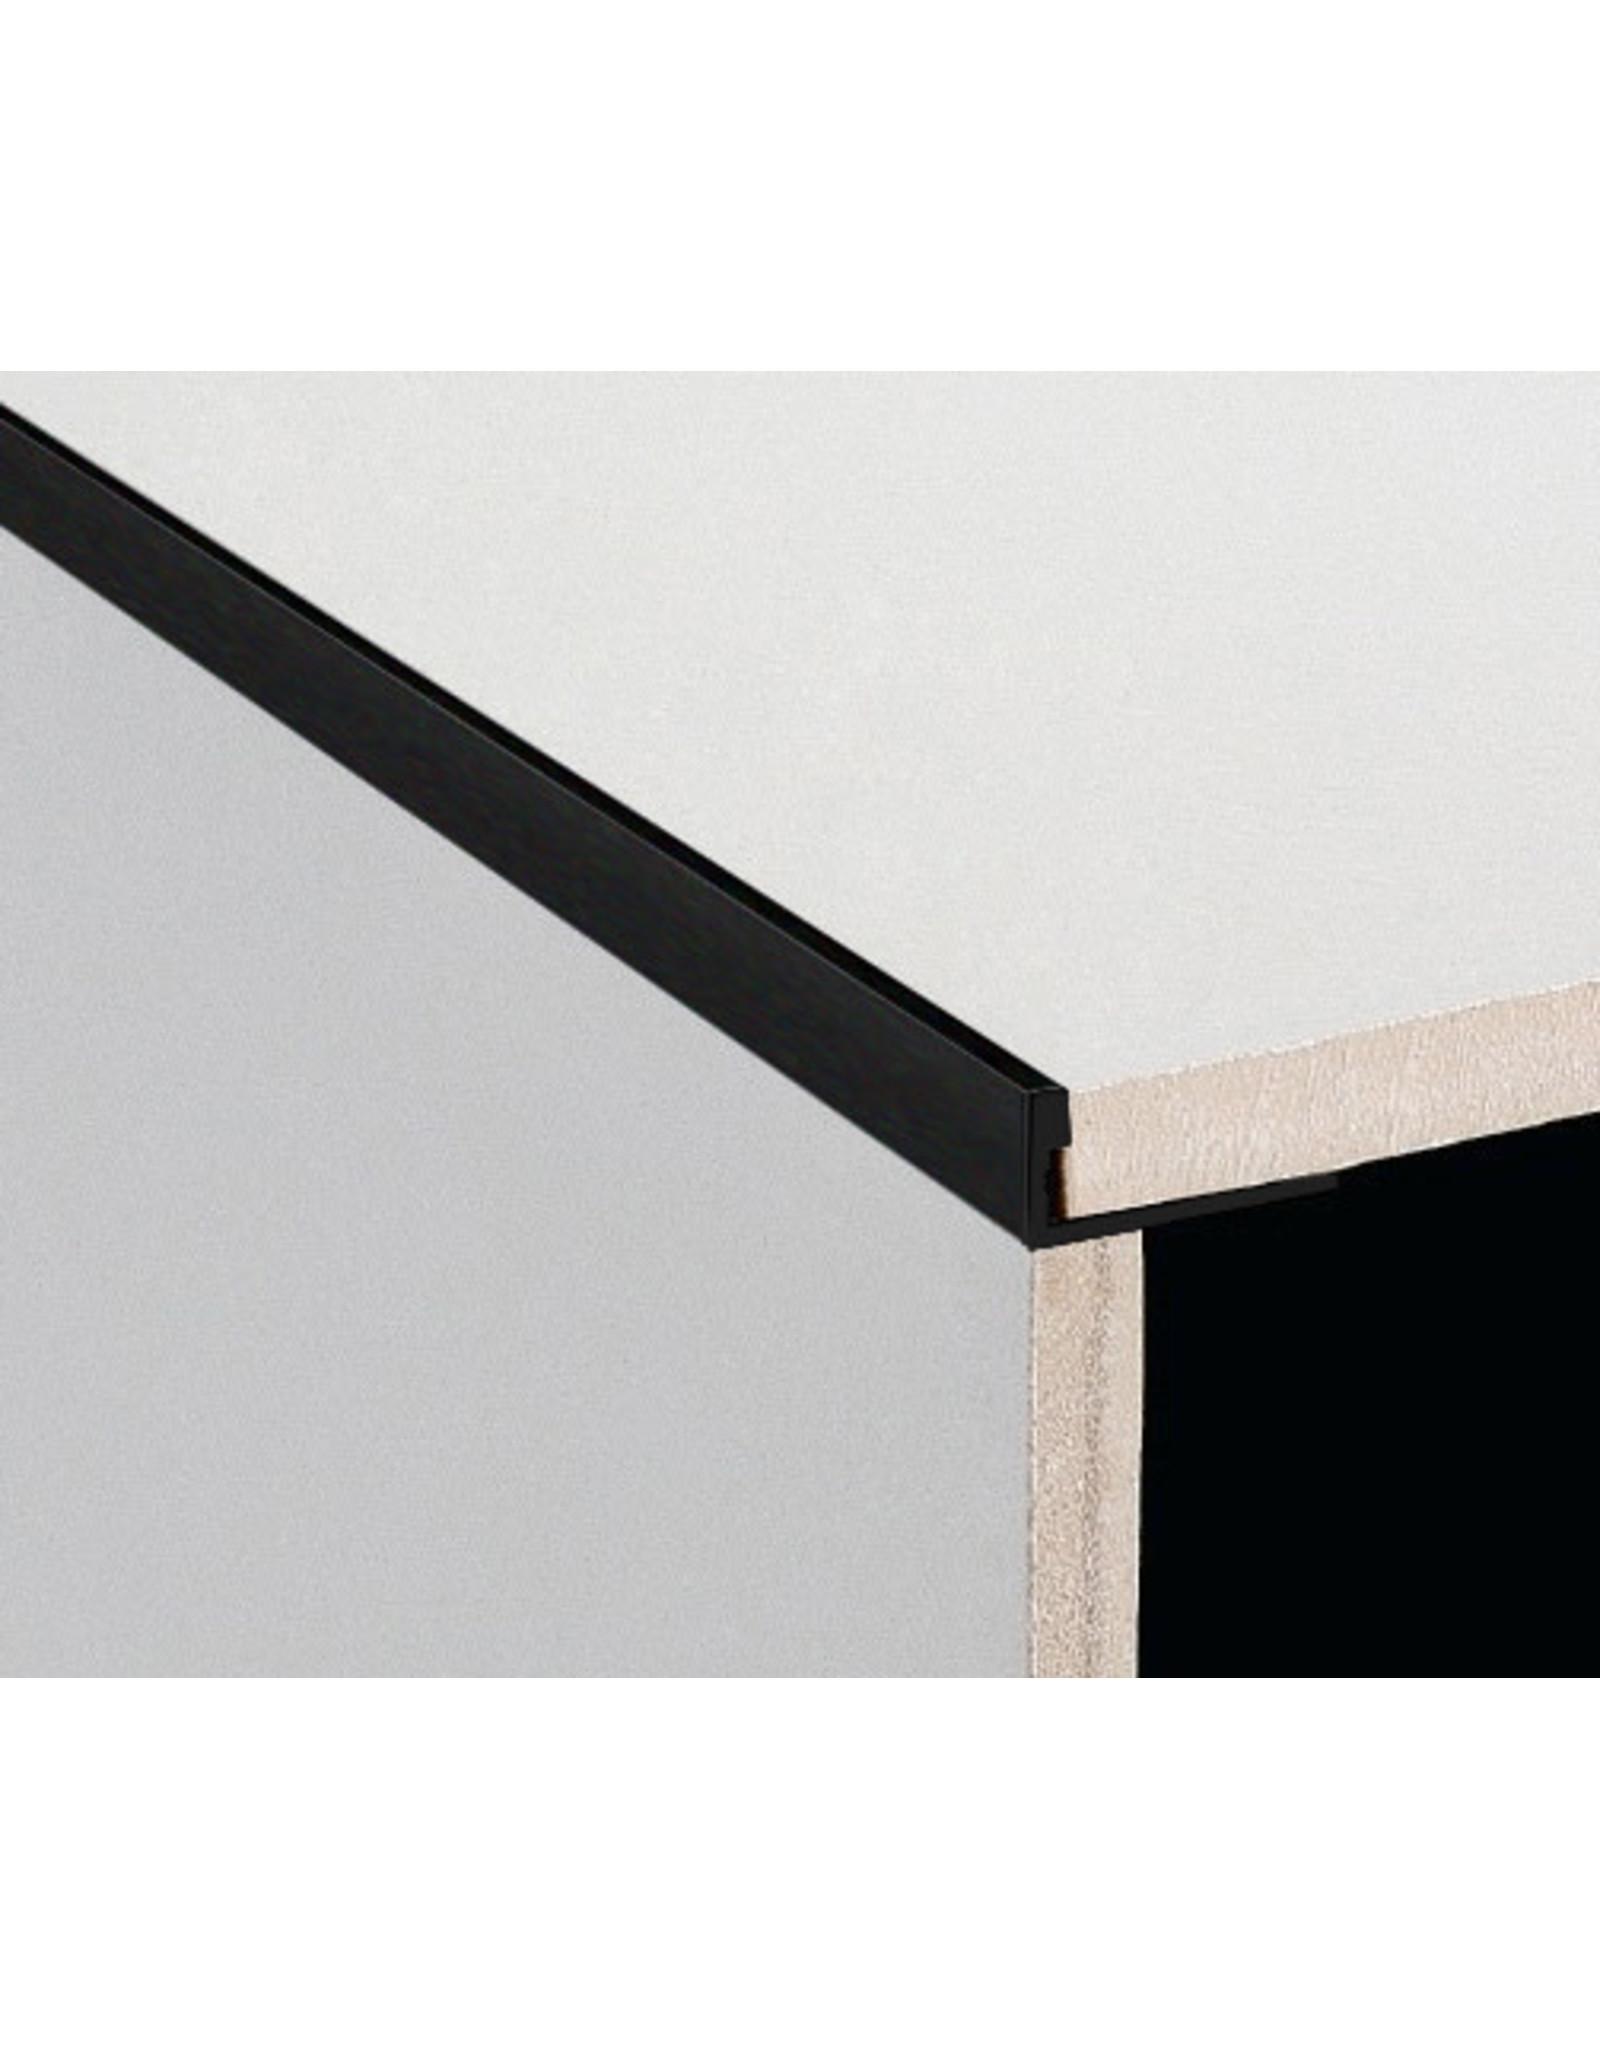 DTA 11mm DTA Aluminium L-Shape Trim Brushed Black